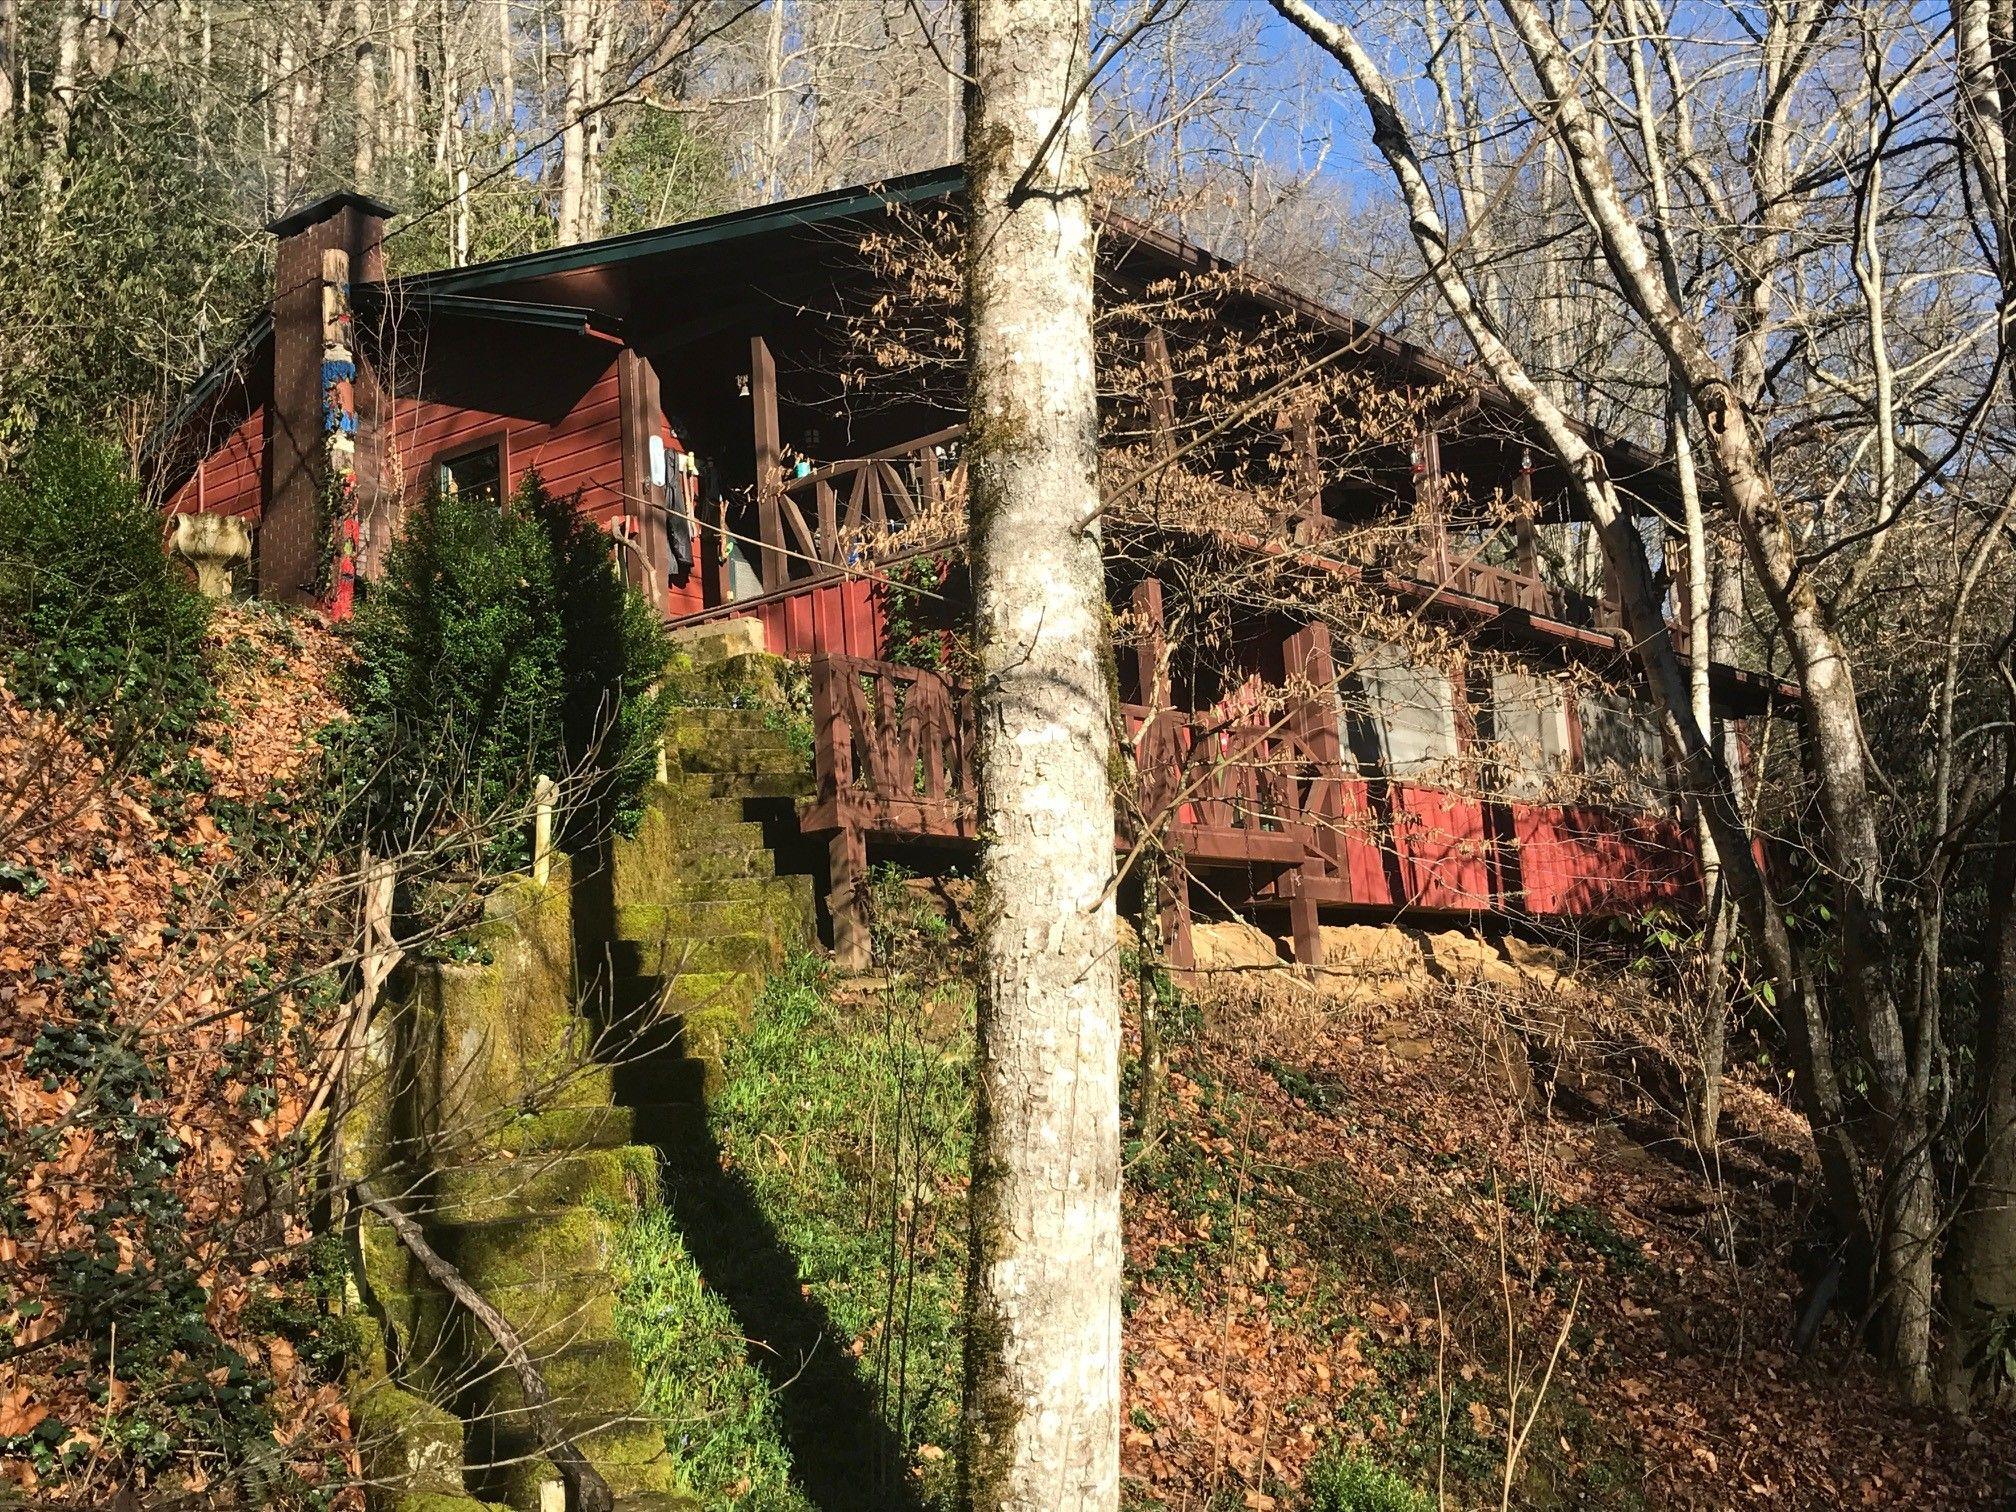 travel cabins helen near georgia ga steemit cabin towns creek freedomcoin